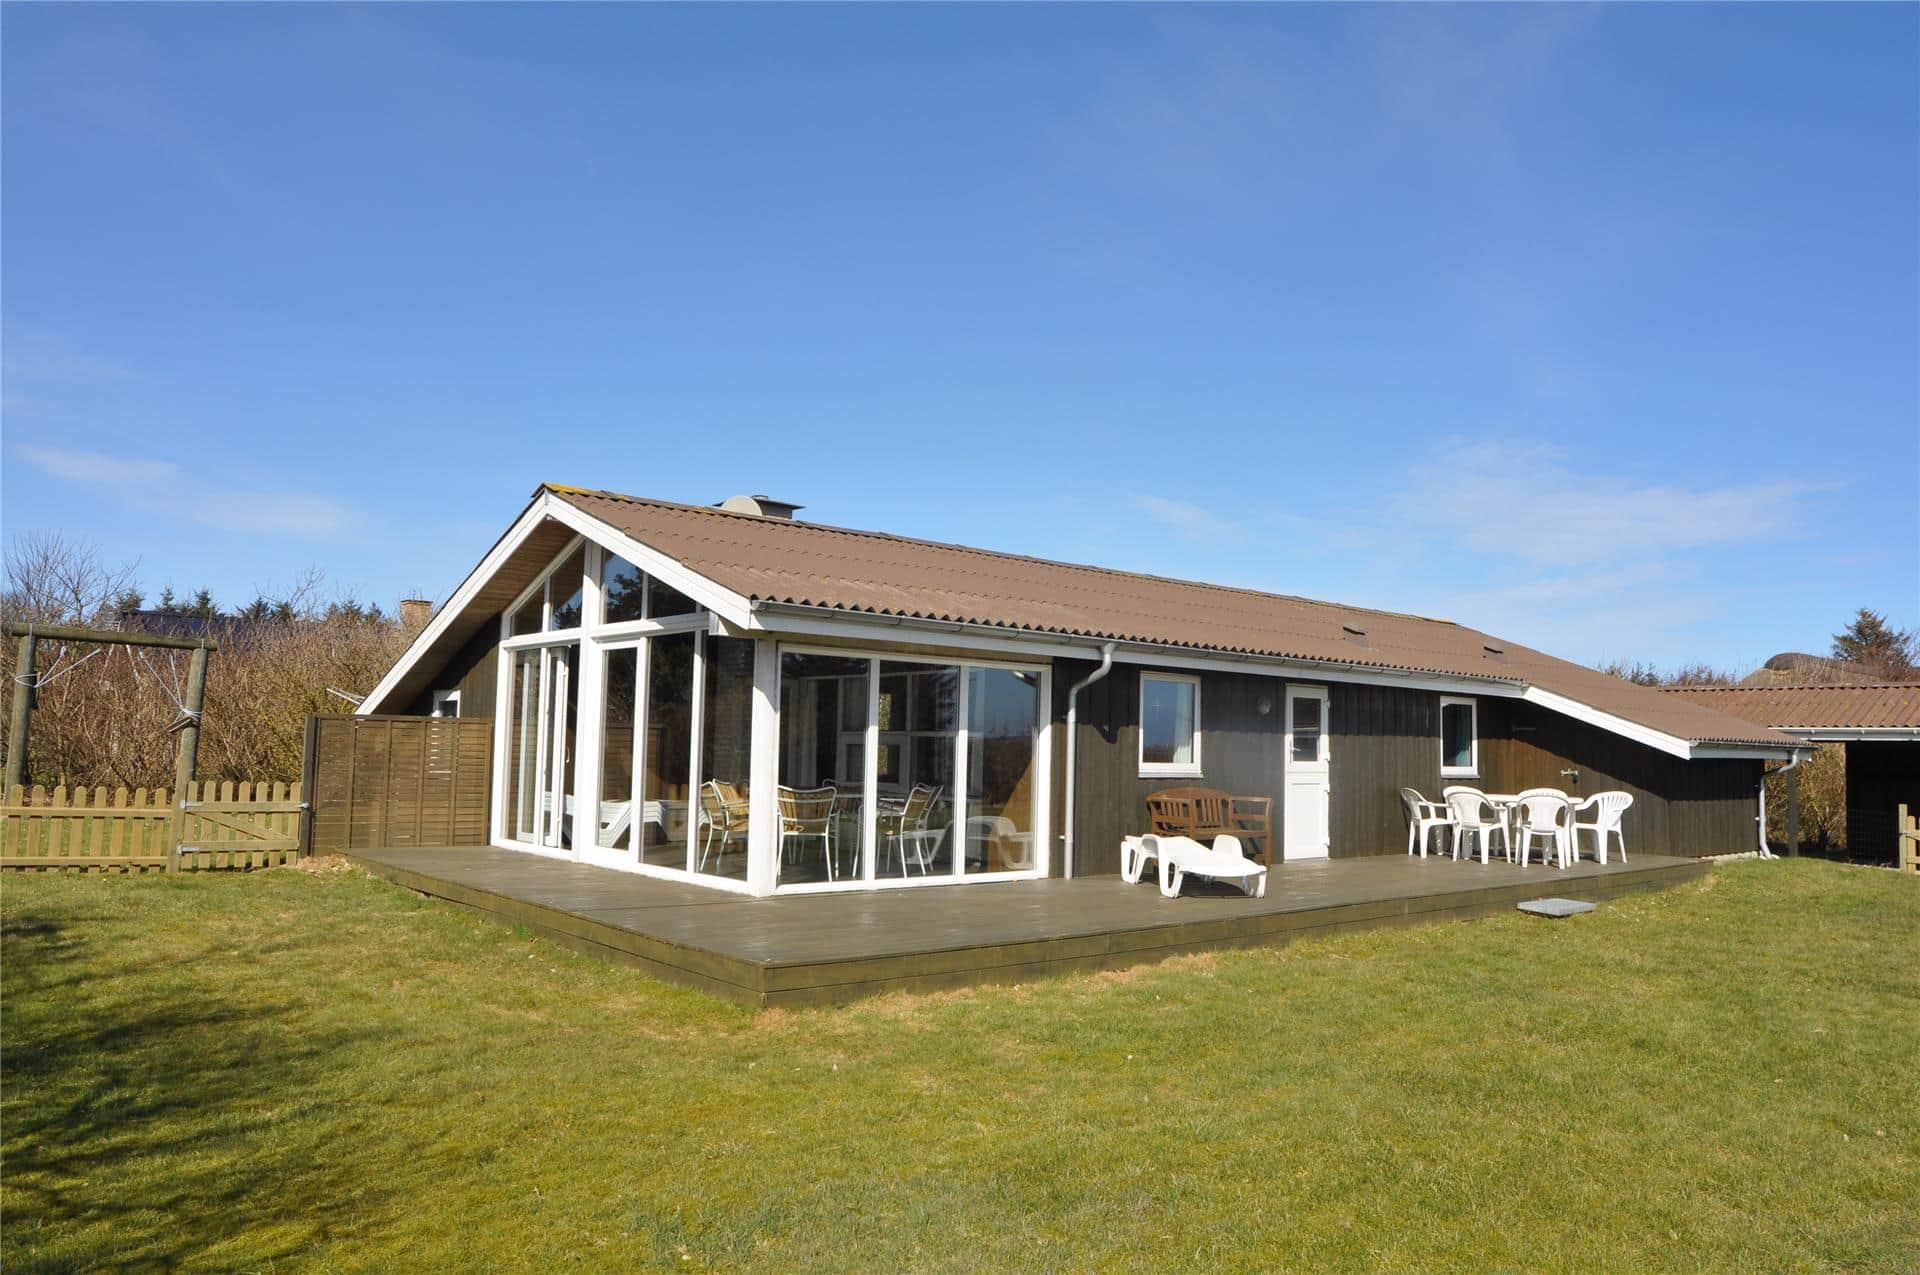 Image 1-175 Holiday-home 40703, Helmklit 227, DK - 6990 Ulfborg